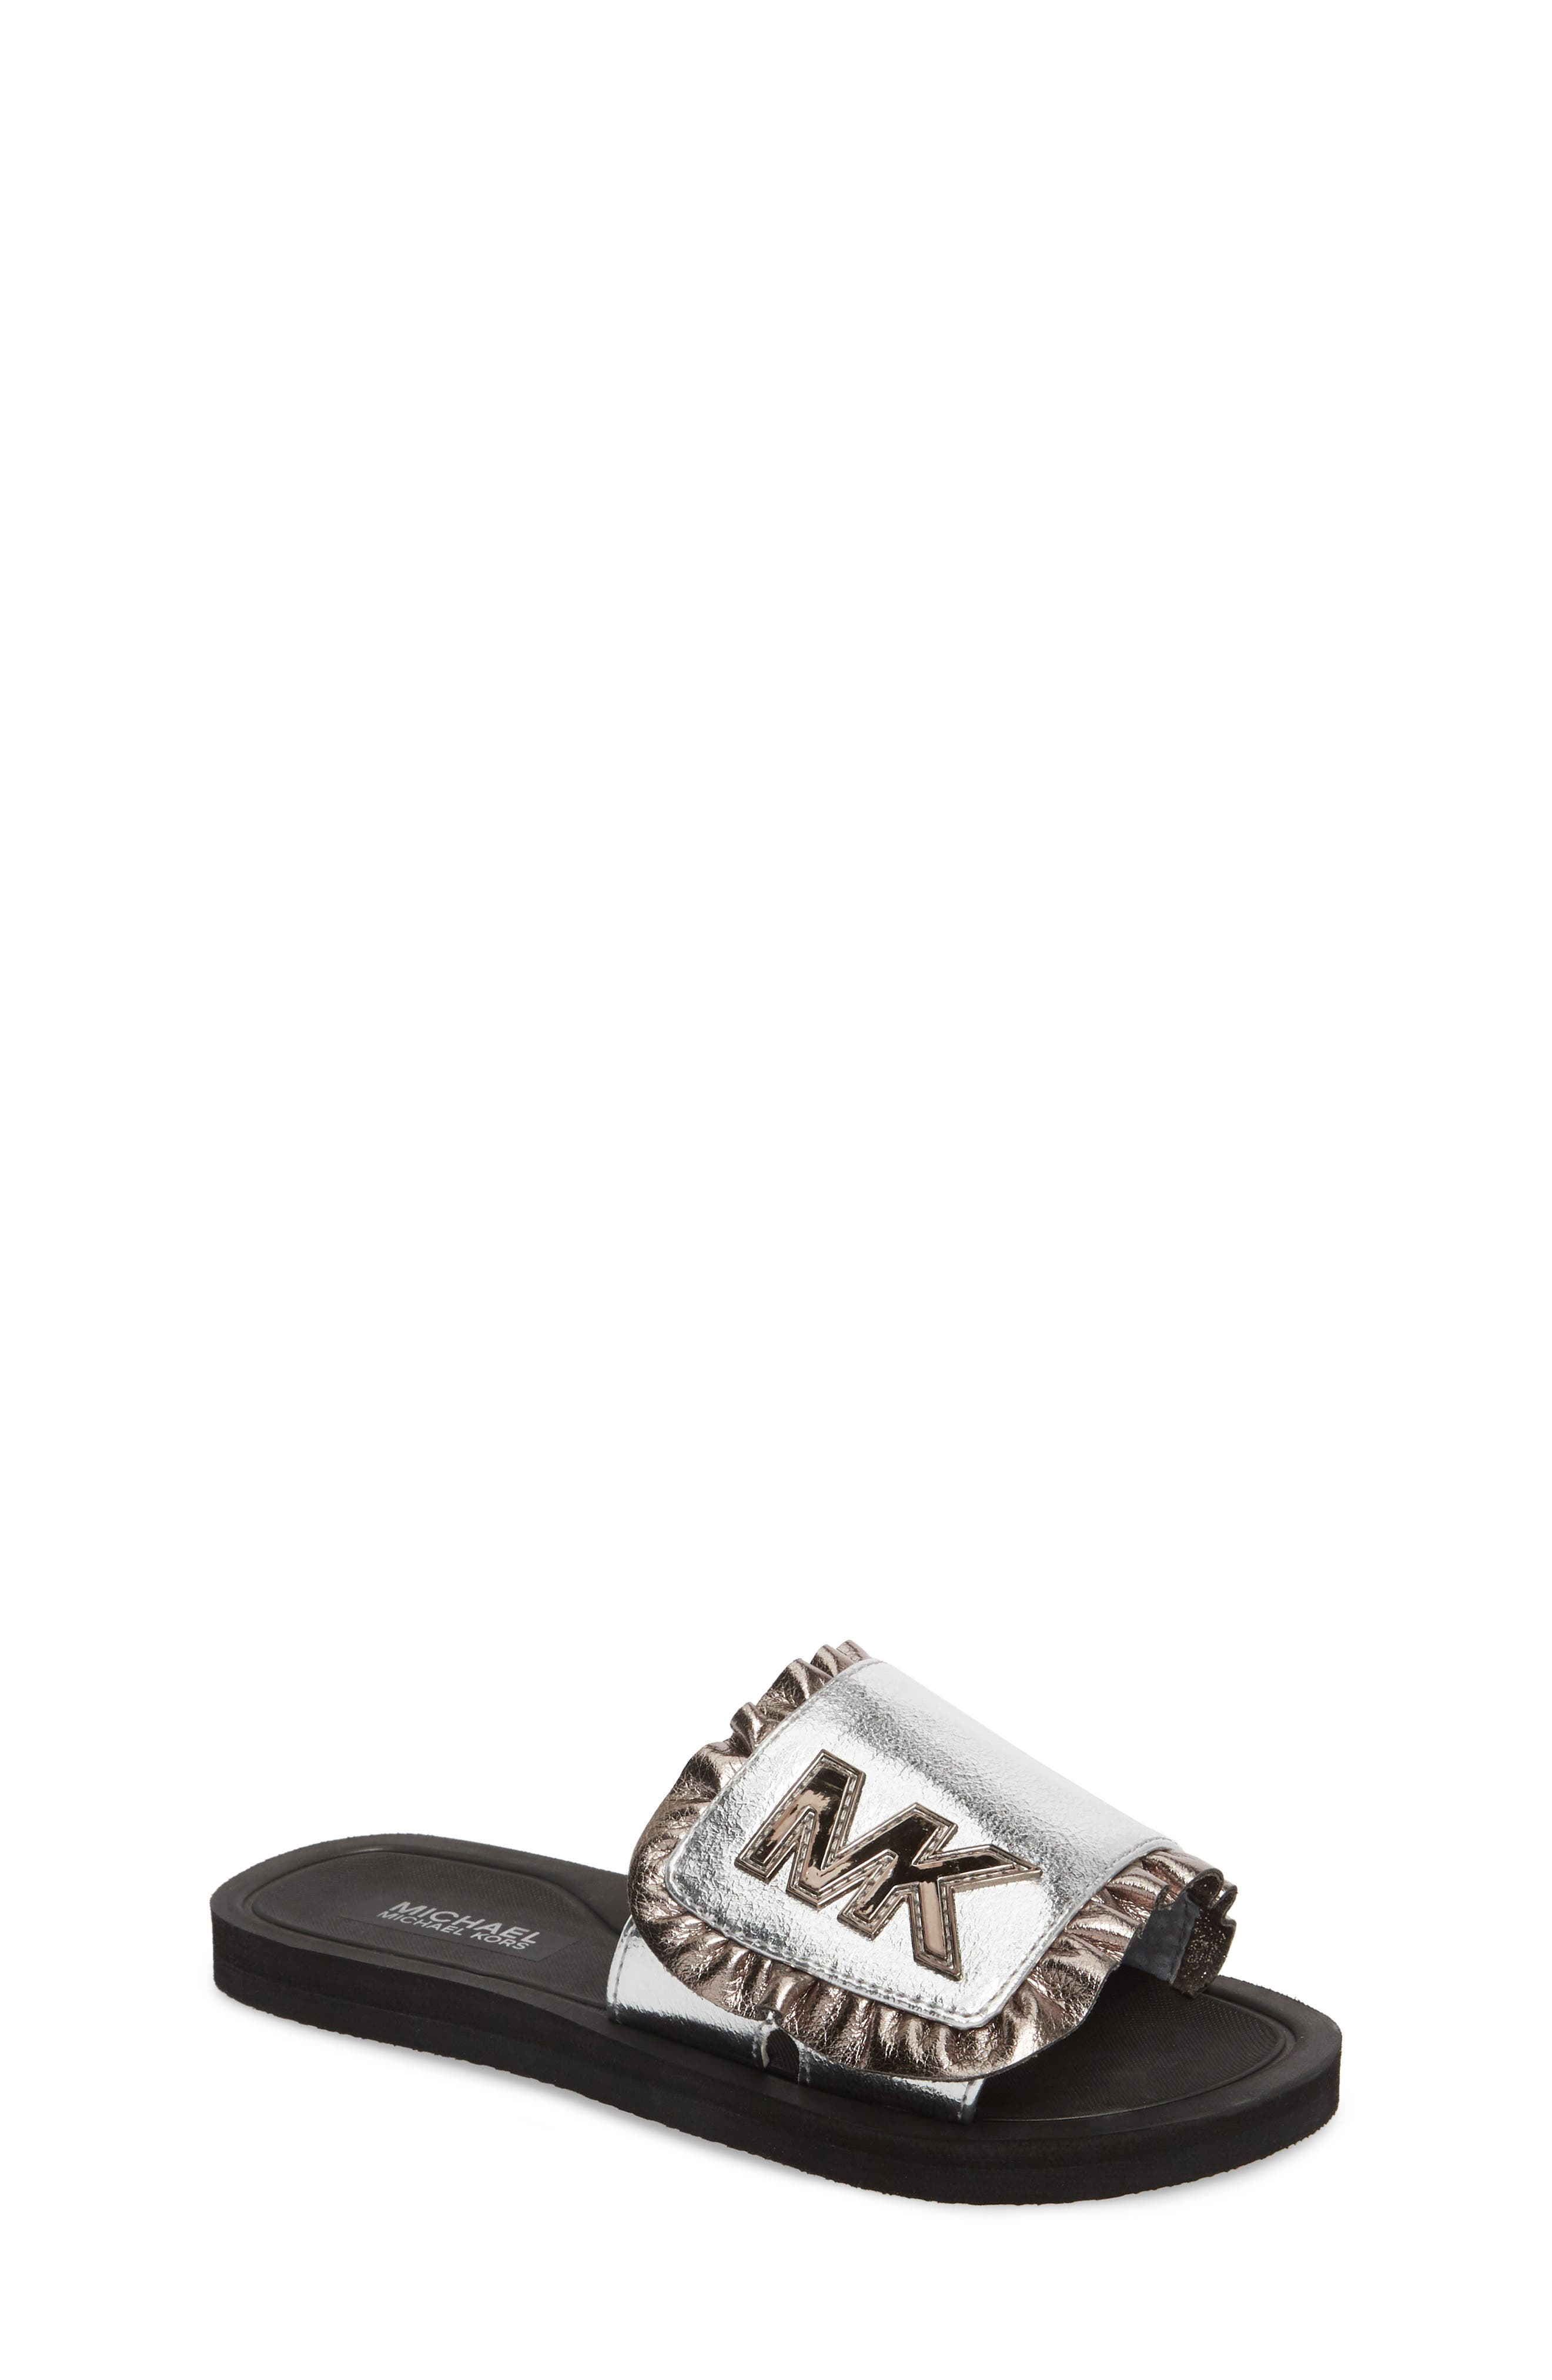 Eli Jack Metallic Slide Sandal,                             Main thumbnail 1, color,                             Silver